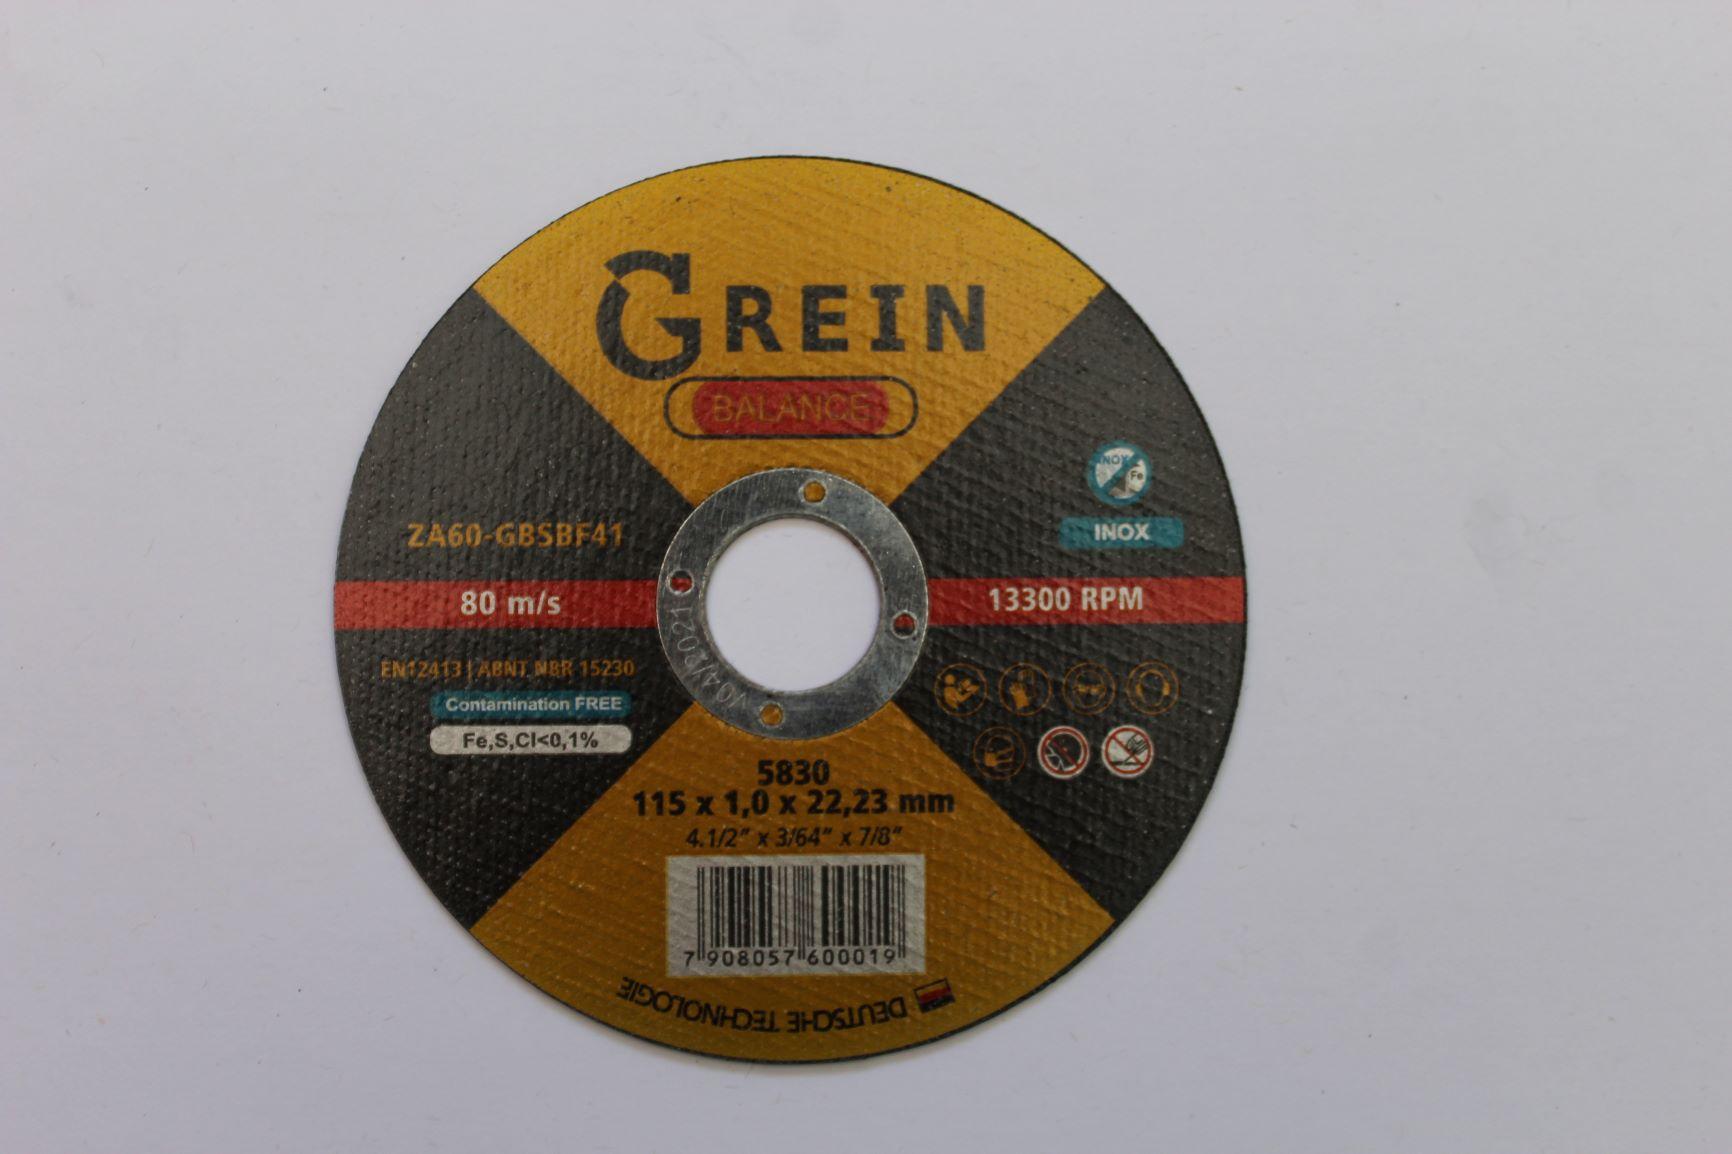 Disco de Corte Balance - Grein 115 x 3 x 22,23mm